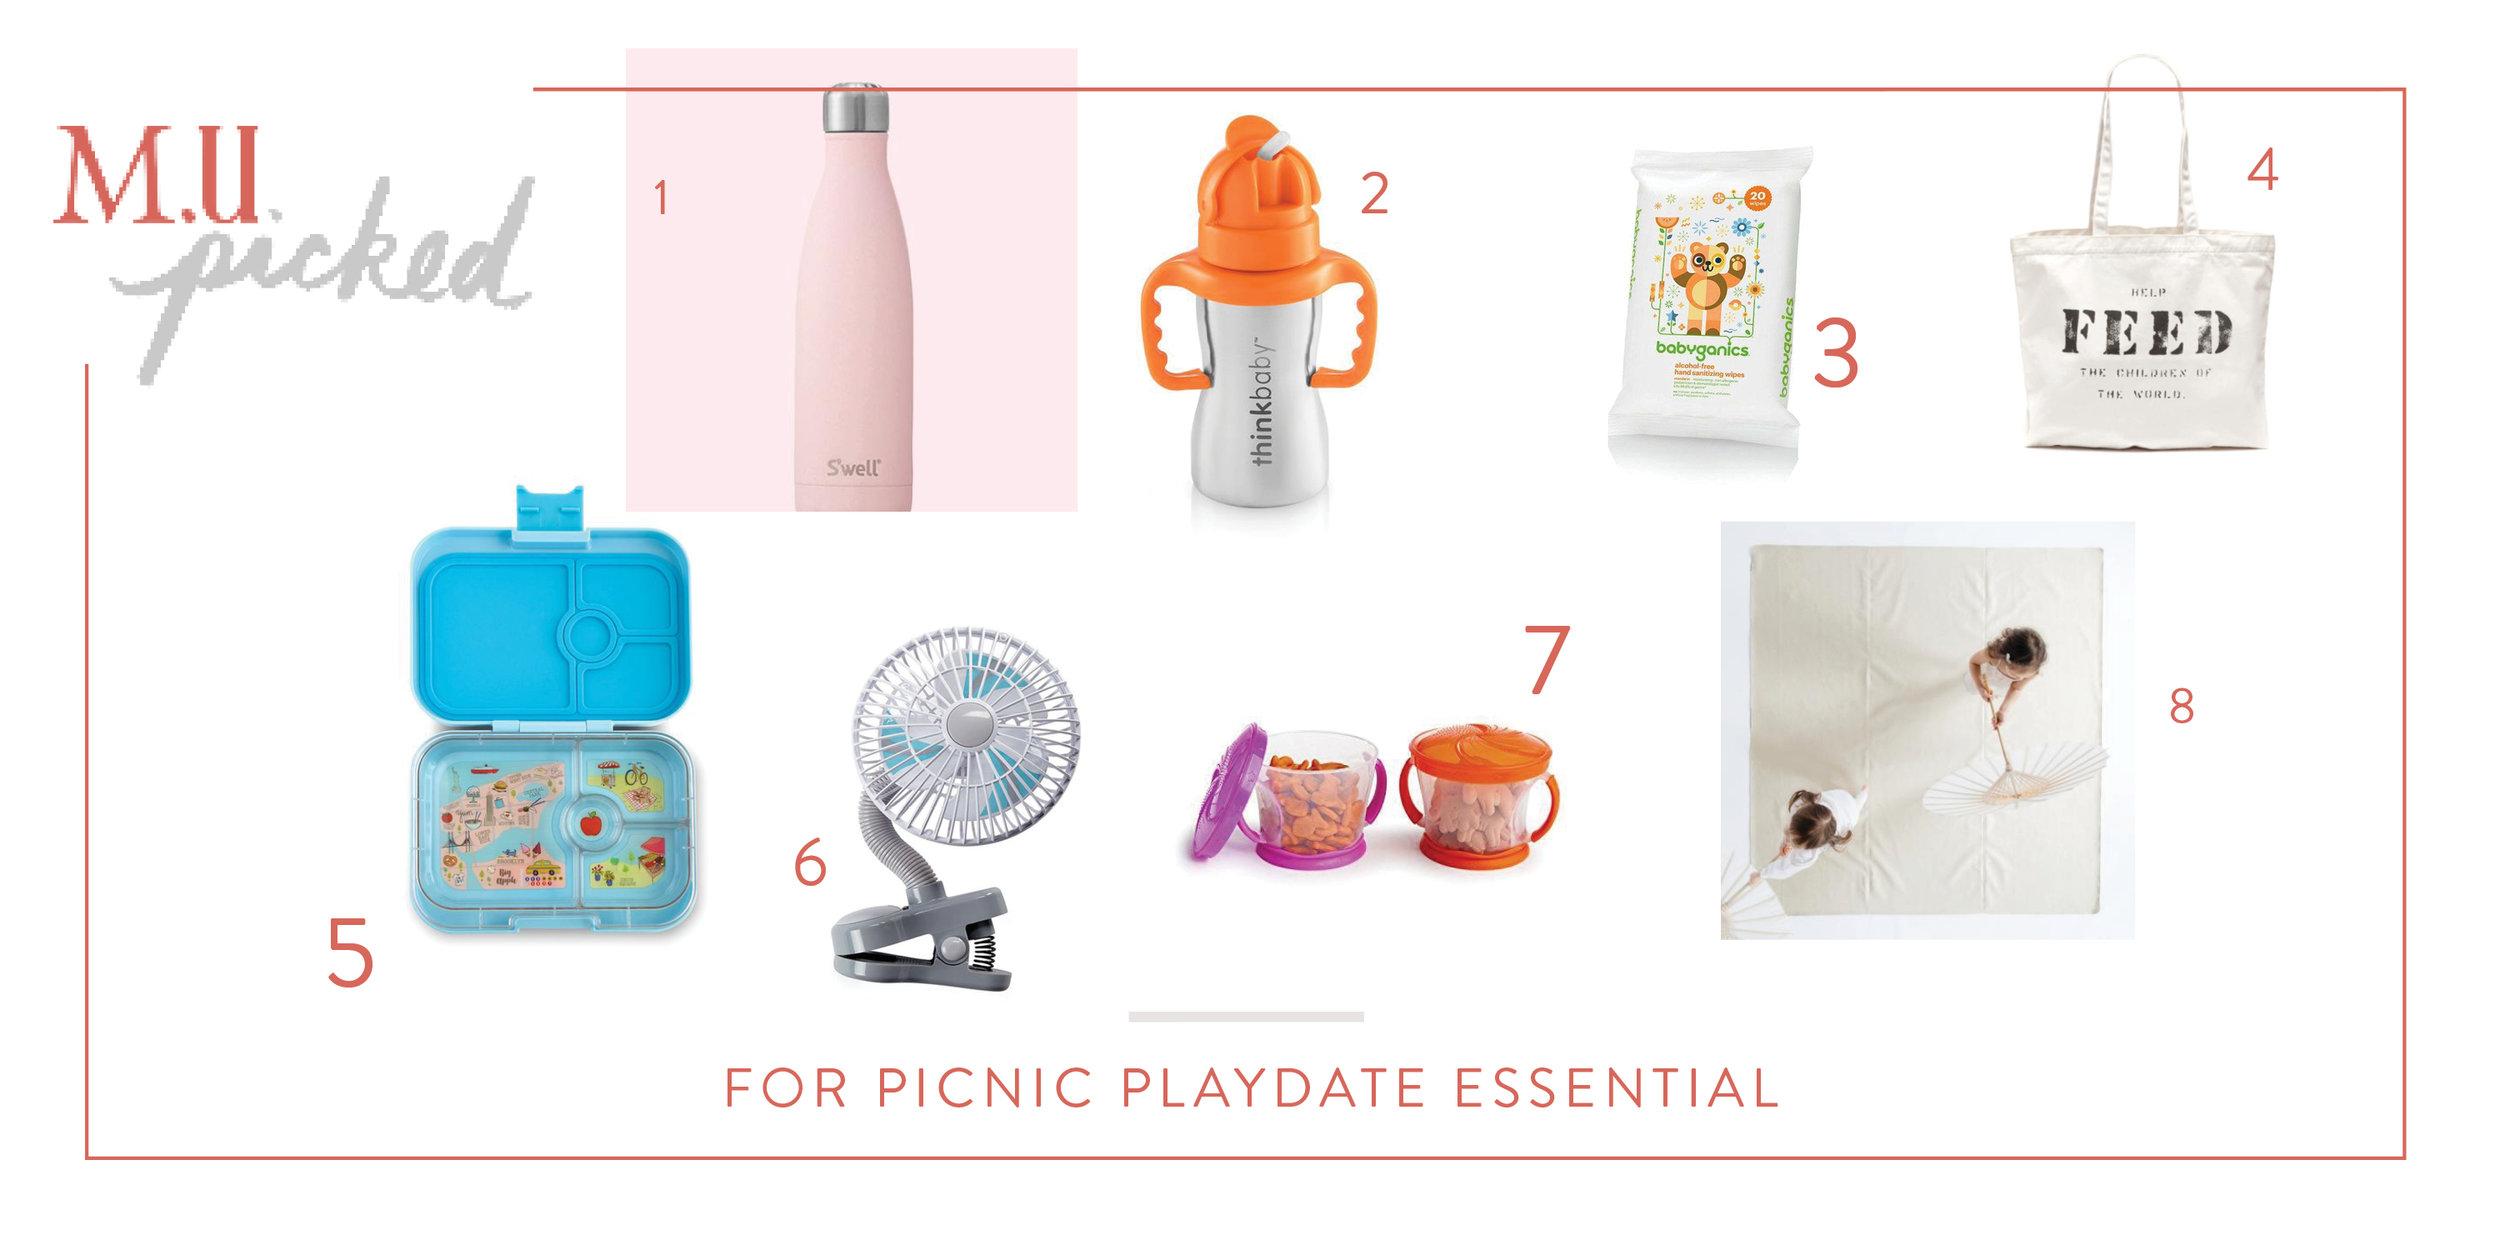 MUPICKED_picnic.jpg